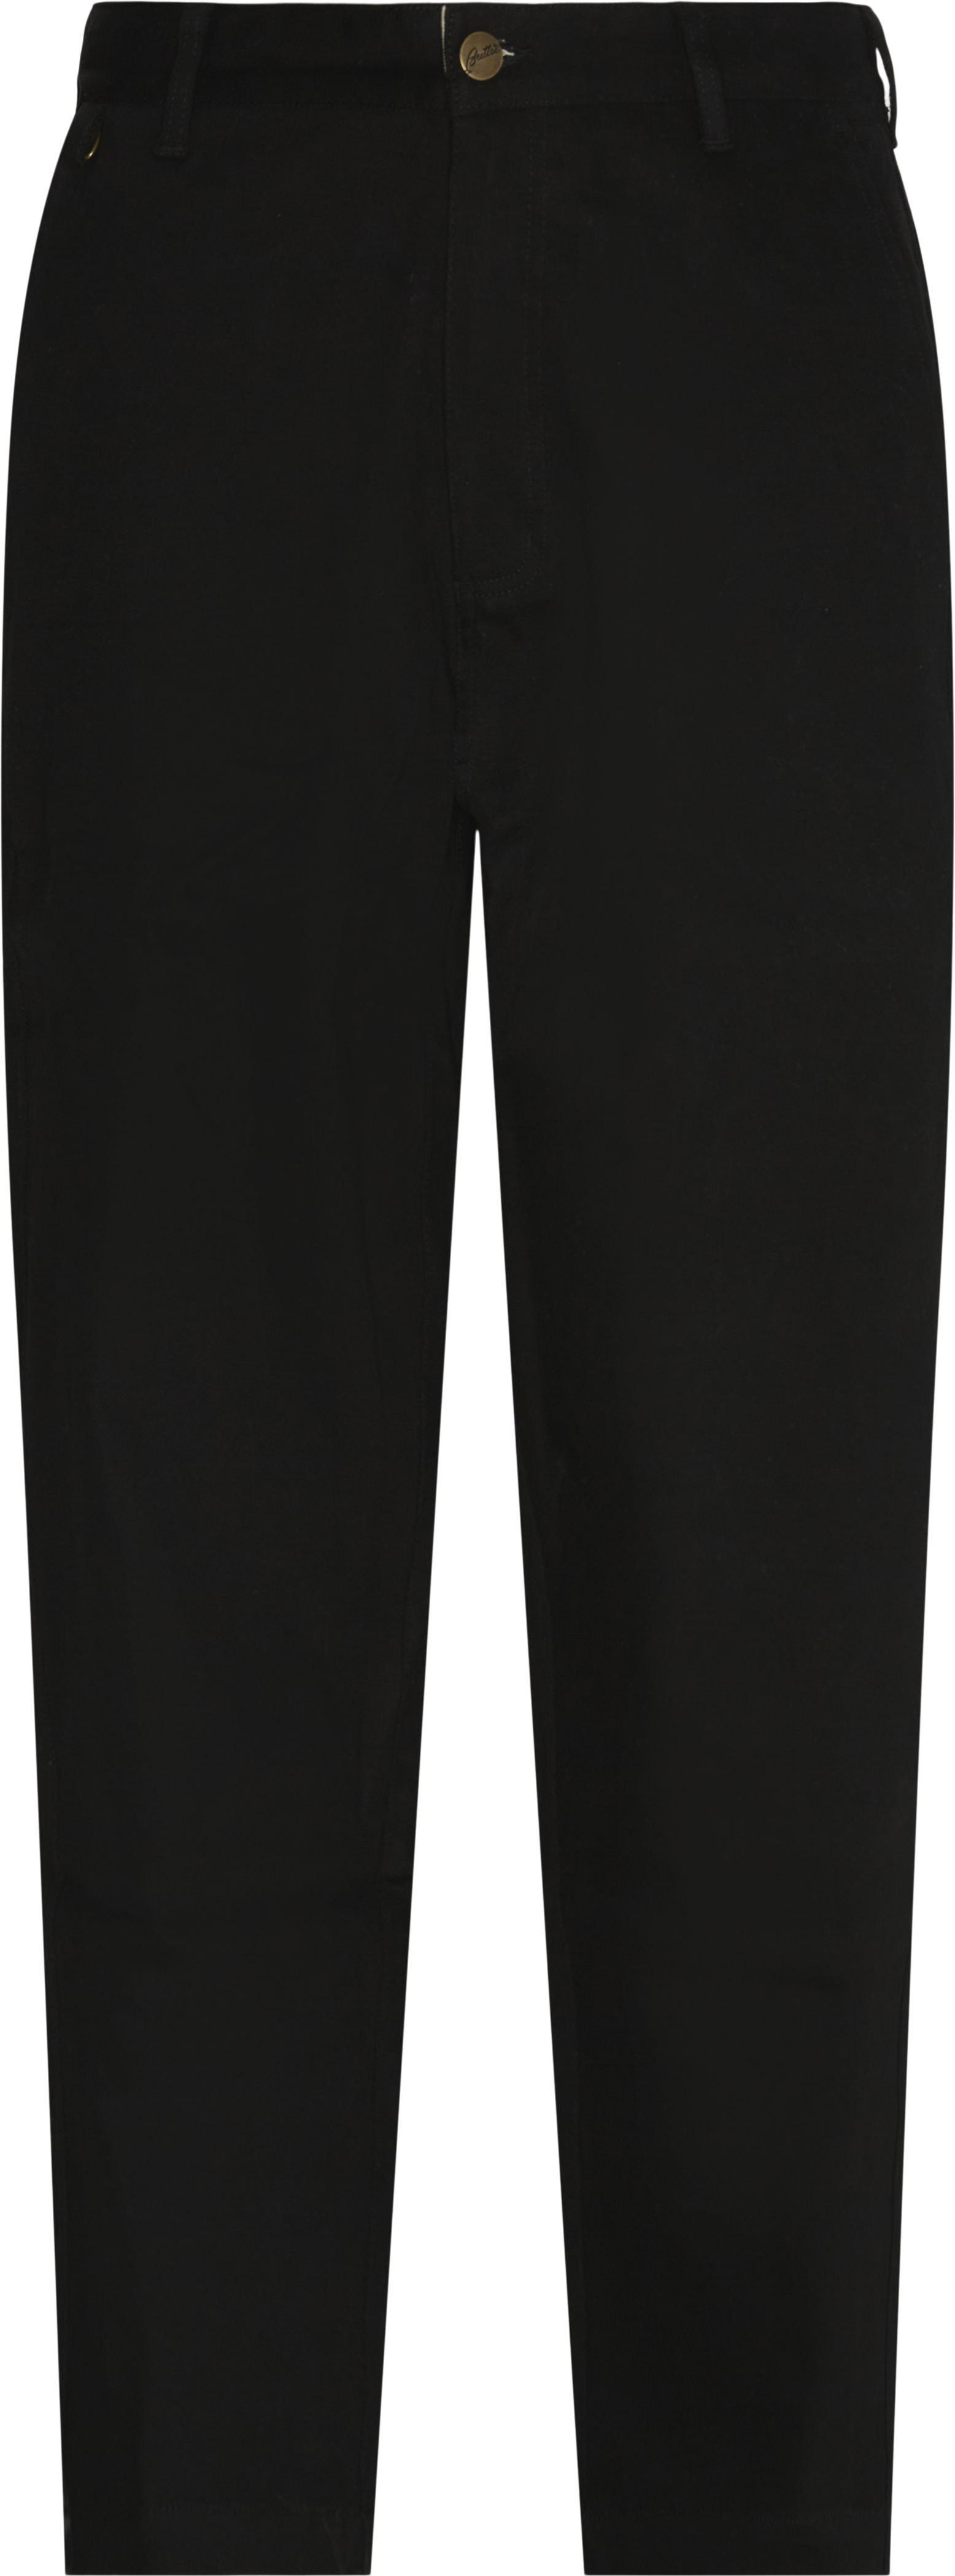 Jeans - Loose fit - Svart